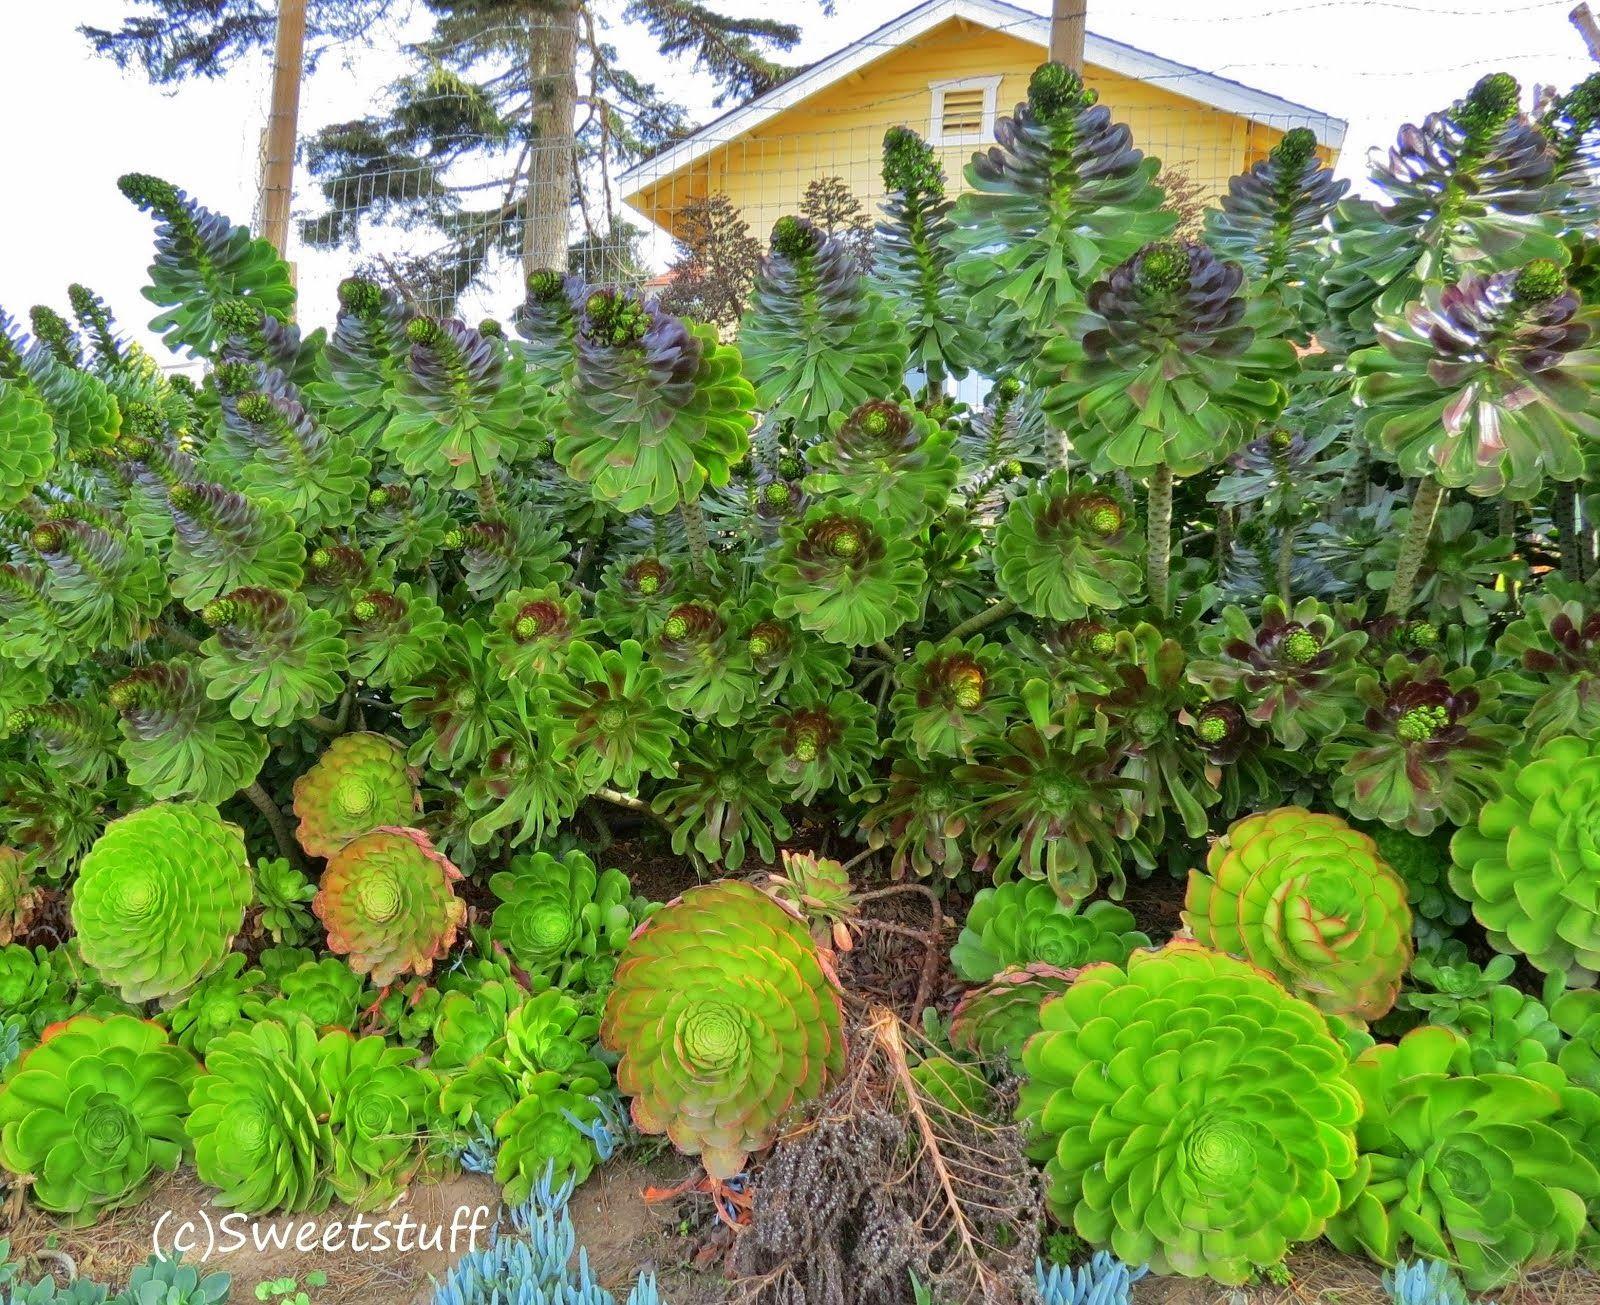 Sweetstuff's Sassy Succulents